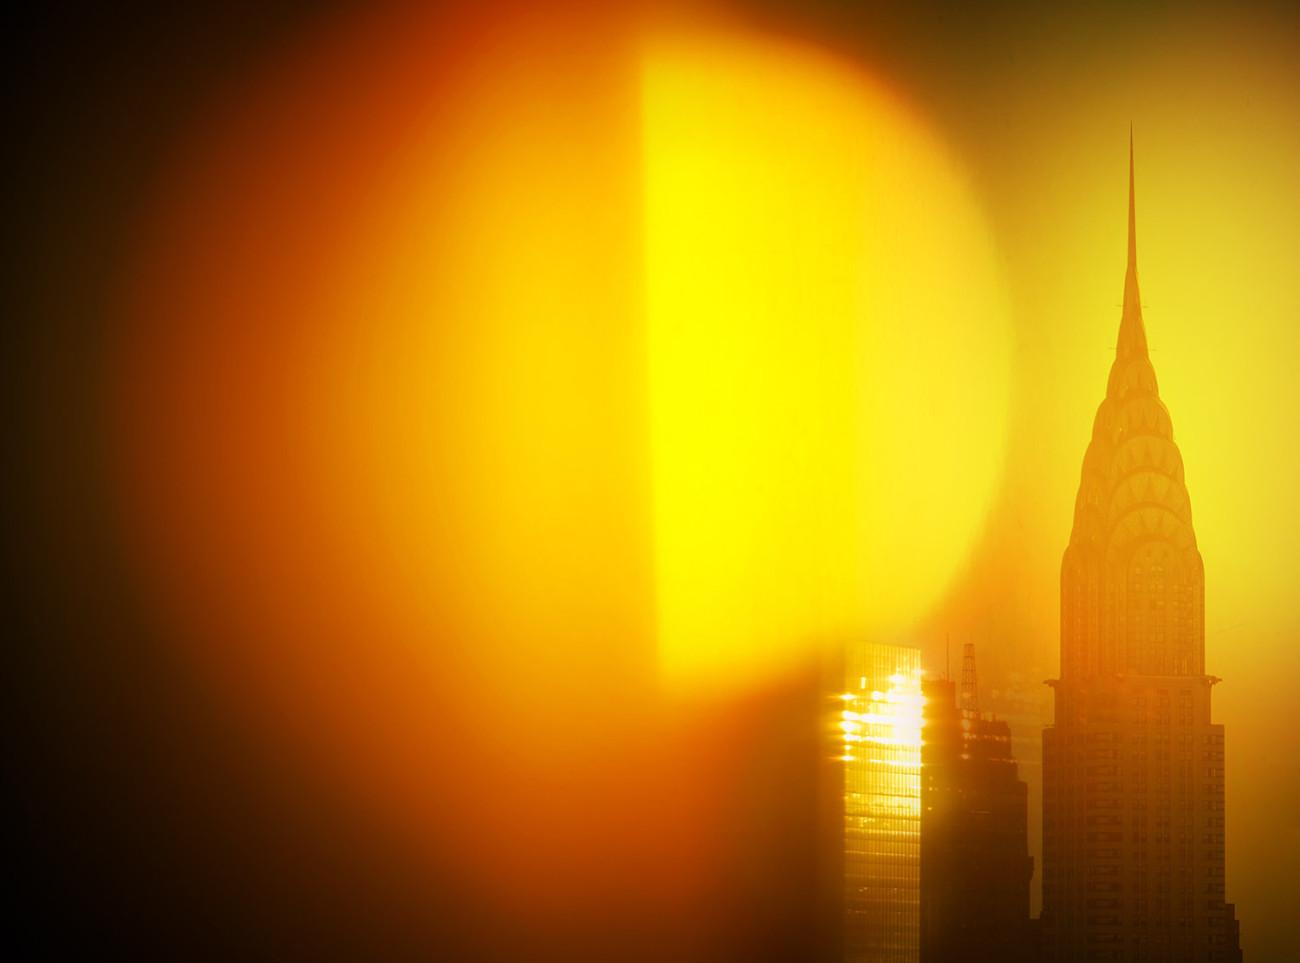 Chrysler Building sunrise, NY, 2016